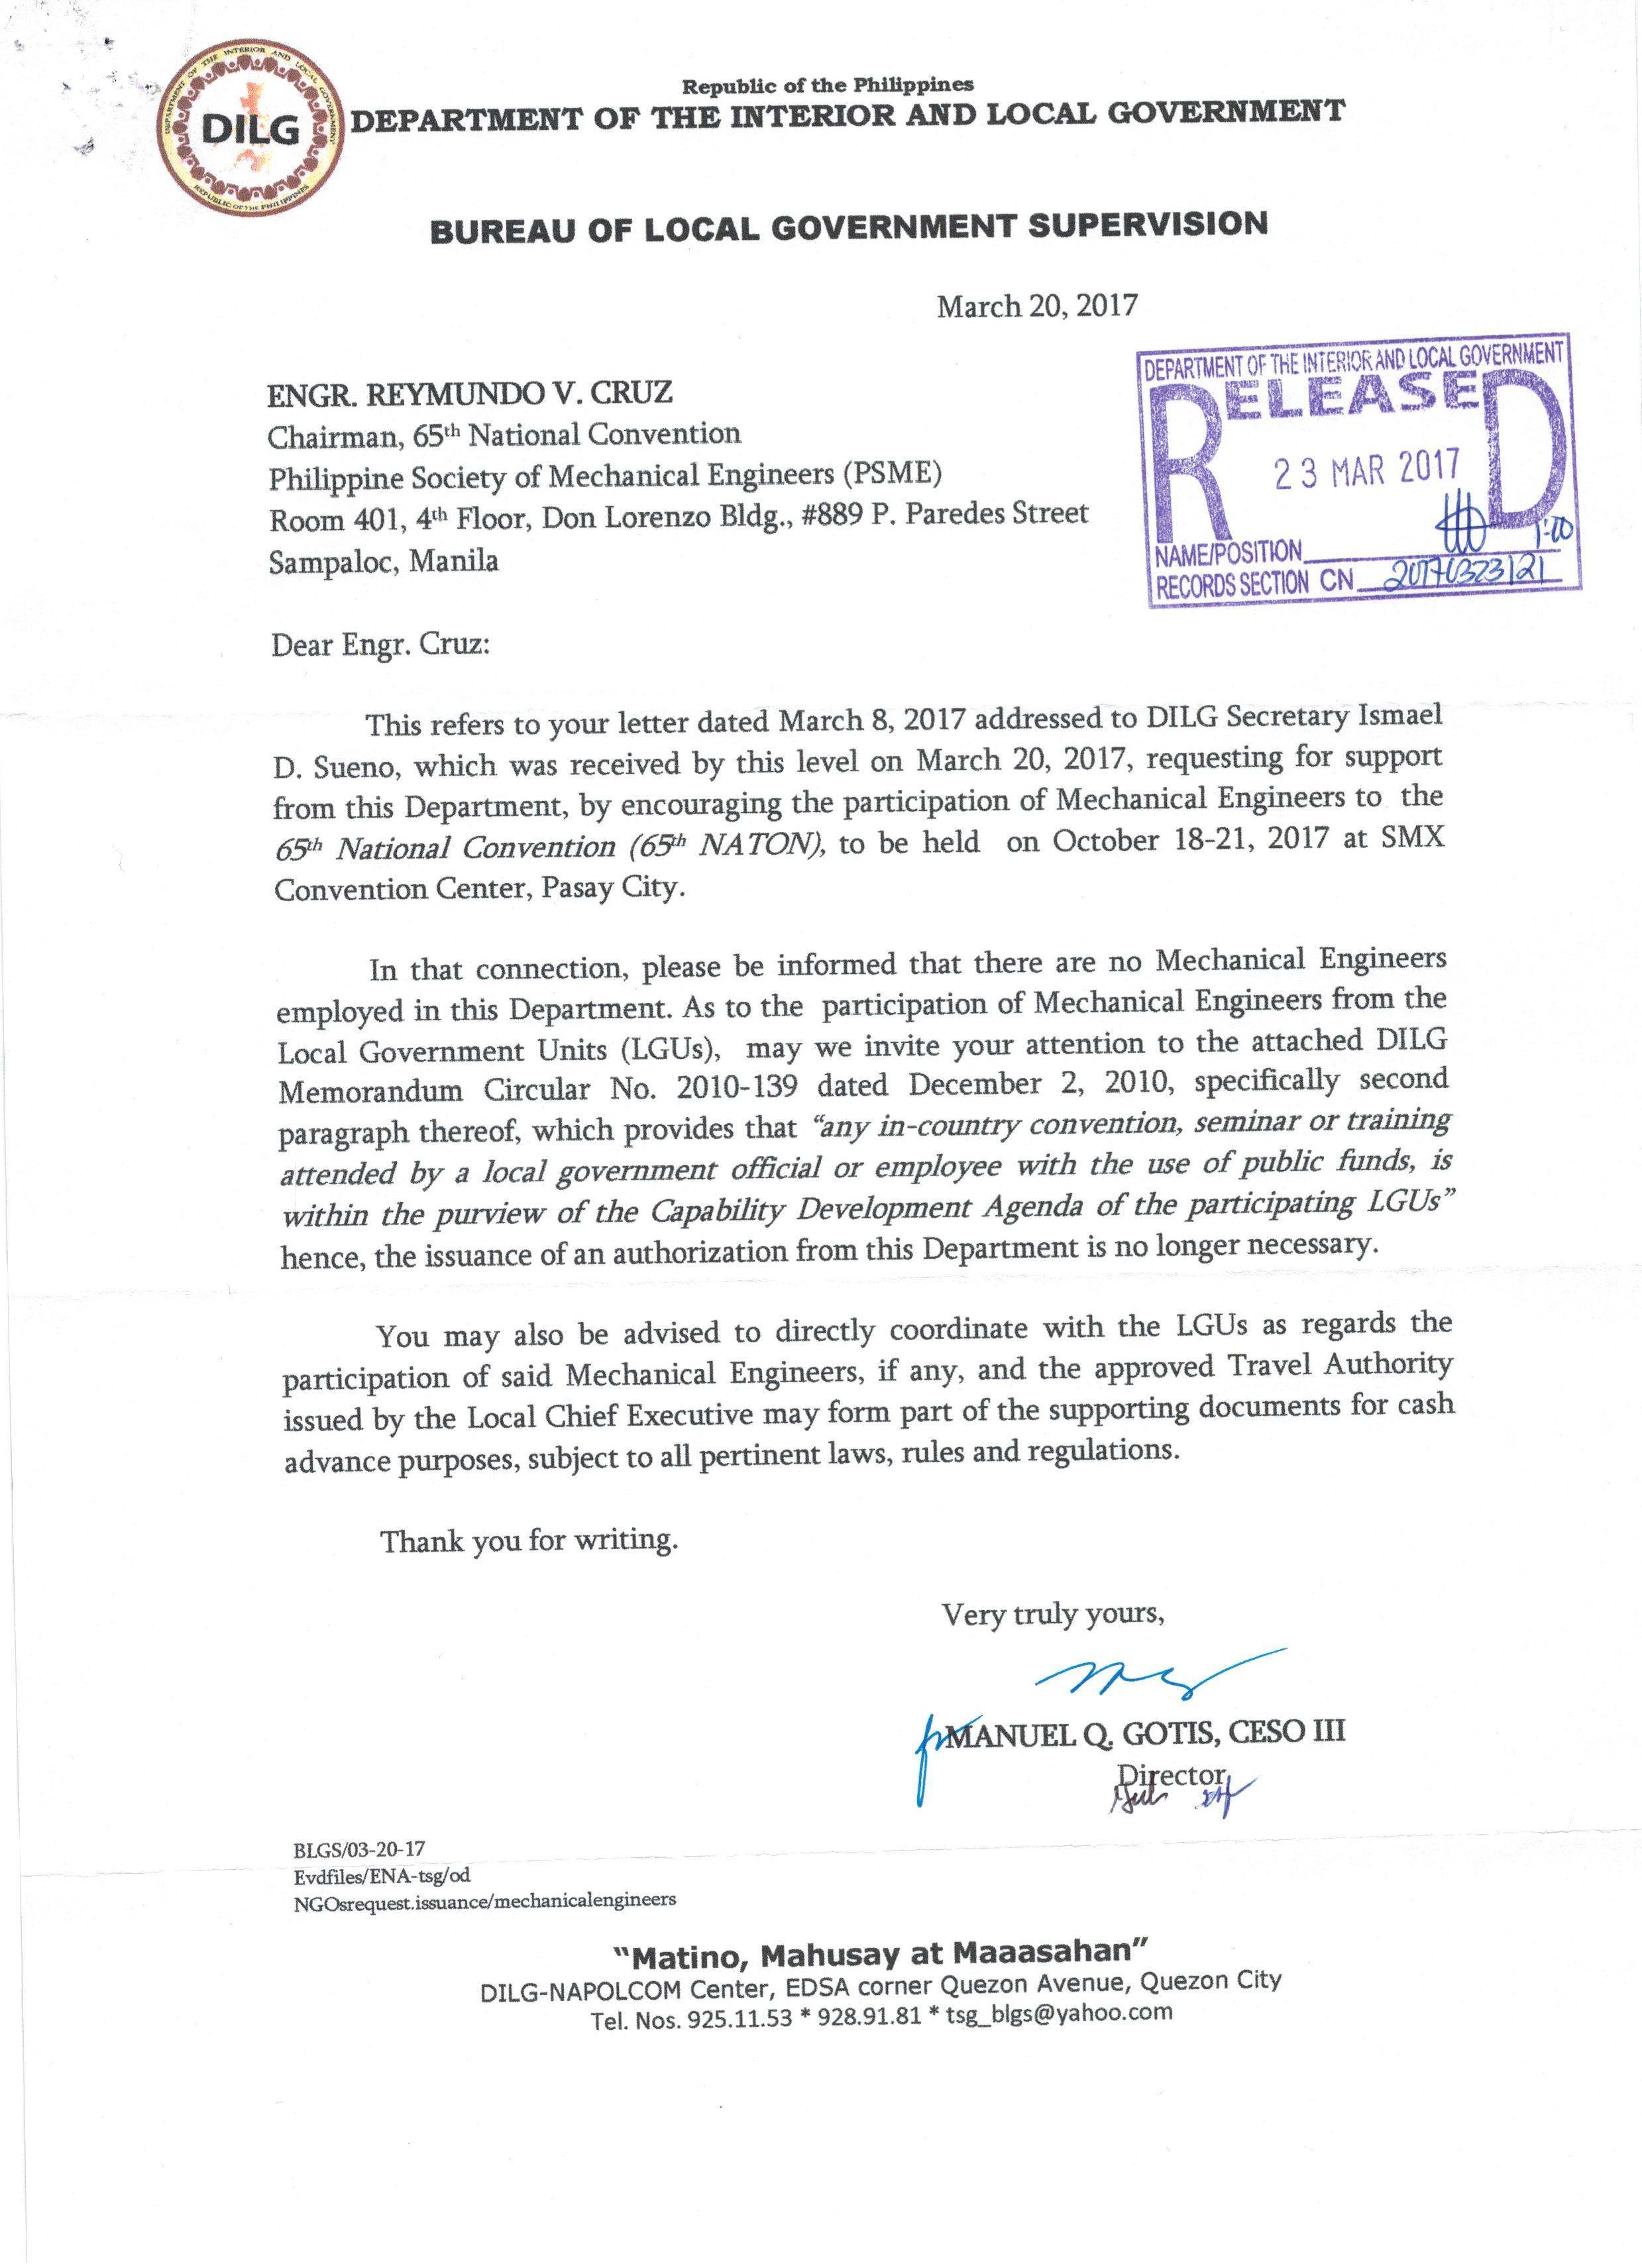 Sample Letter To A Philippine Senator